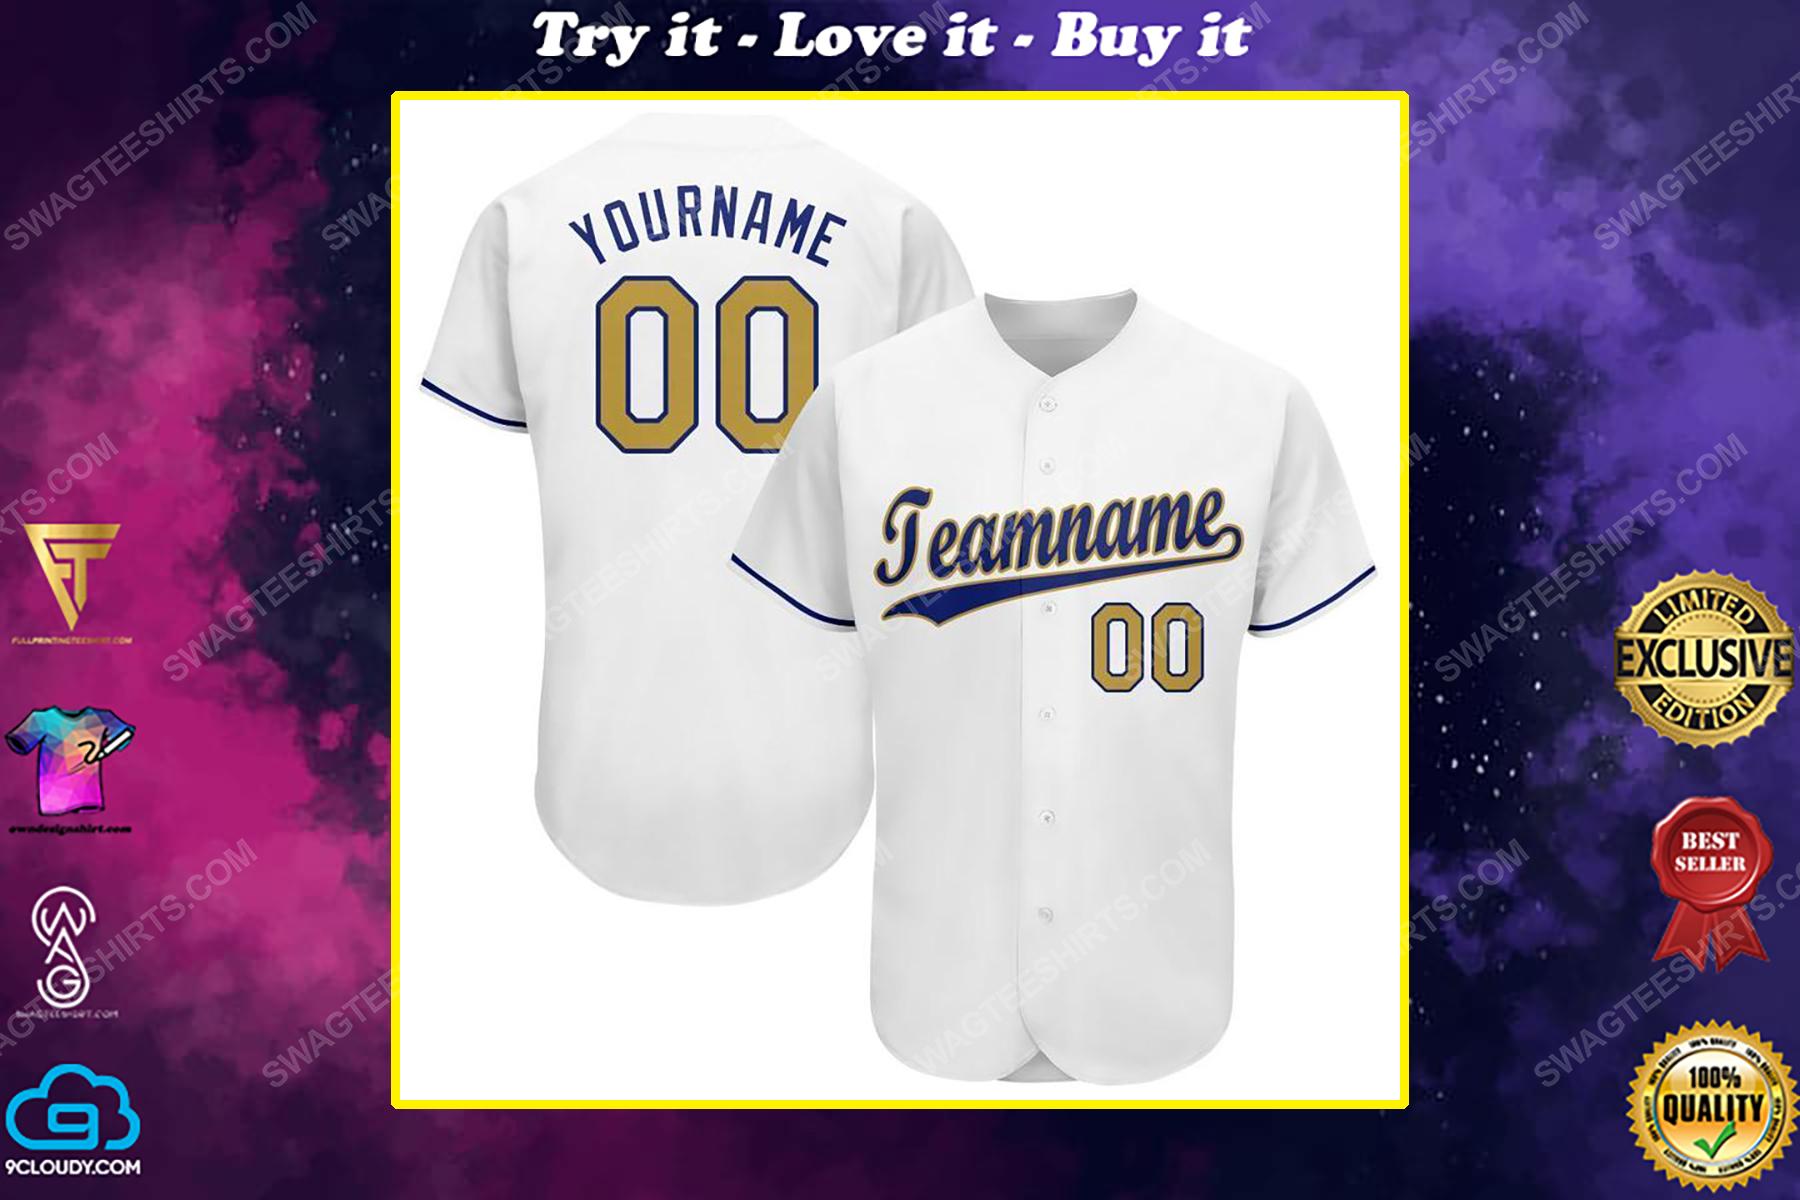 Custom name major league baseball kansas city royals baseball jersey